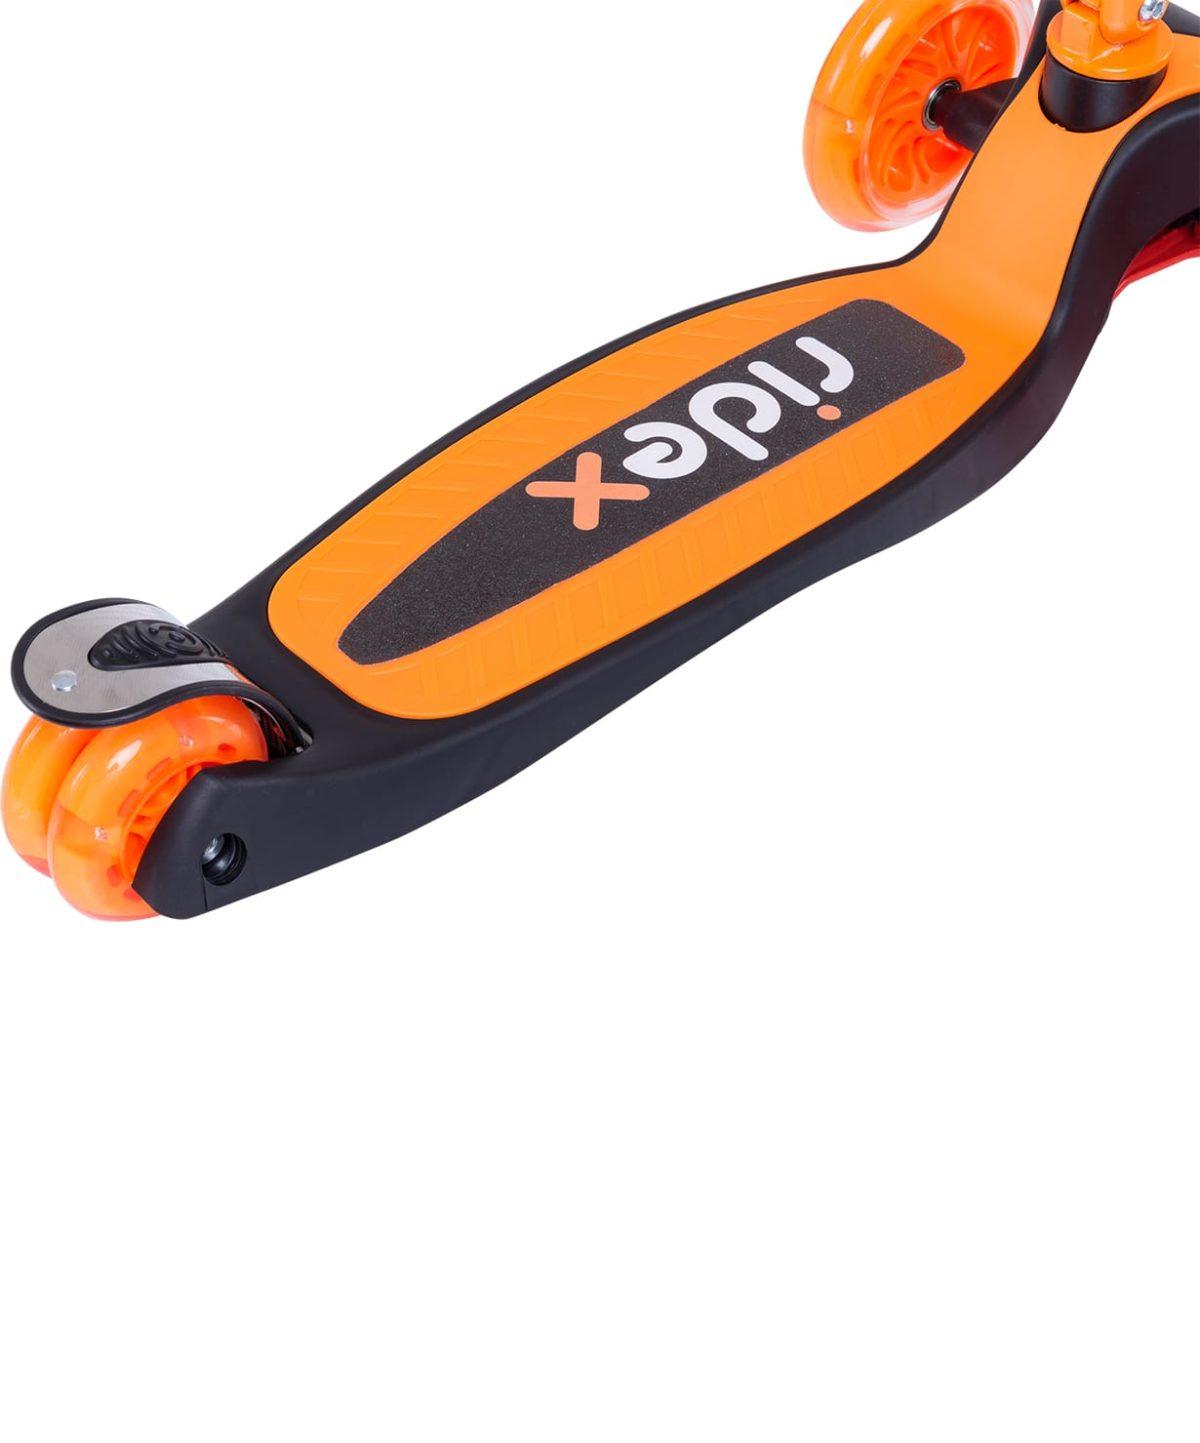 RIDEX 3D Tiny Tot Самокат 3-колесный Tiny Tot 120/80 мм  Tiny Tot: оранжевый - 5